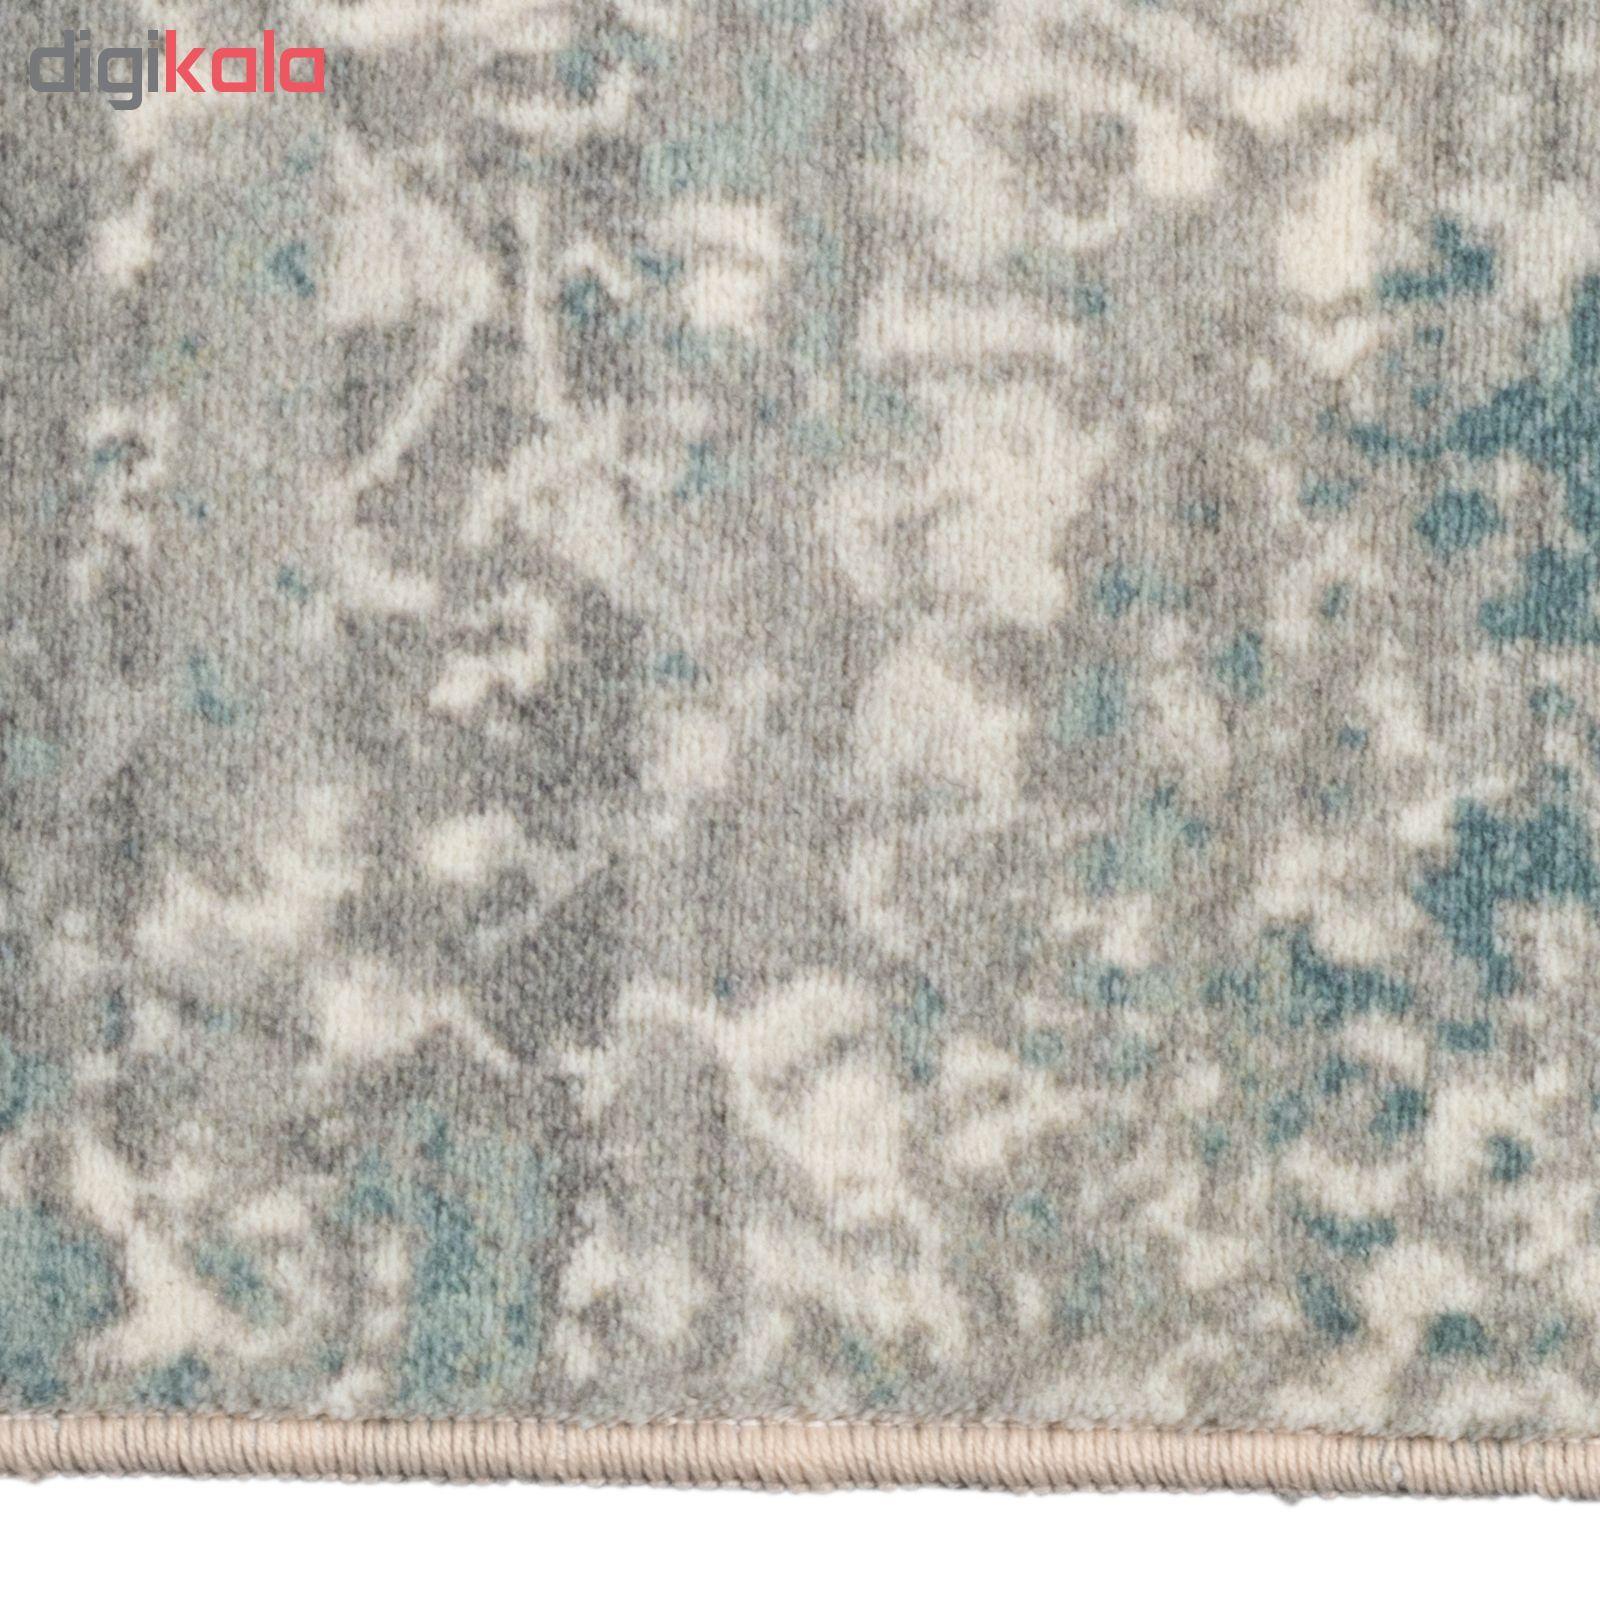 فرش ماشینی محتشم طرح کهنه نما کد 100633 زمینه خاکستری main 1 5